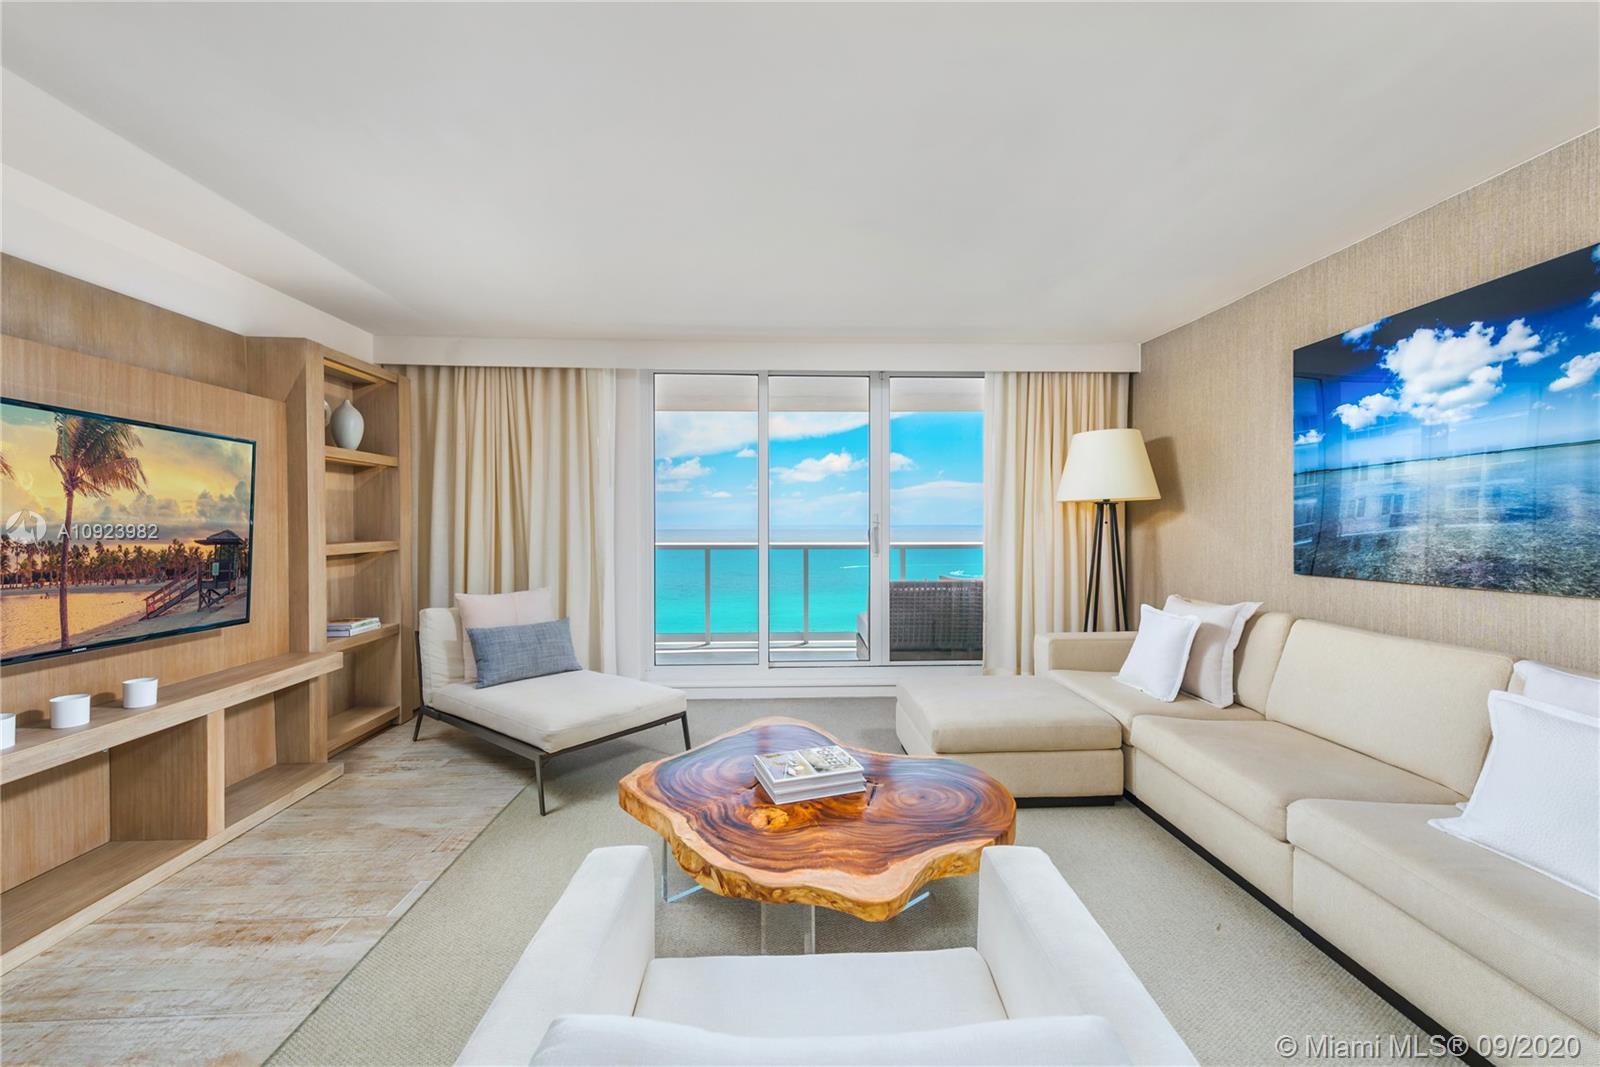 1 Hotel & Homes #1544 - 102 24th St #1544, Miami Beach, FL 33139